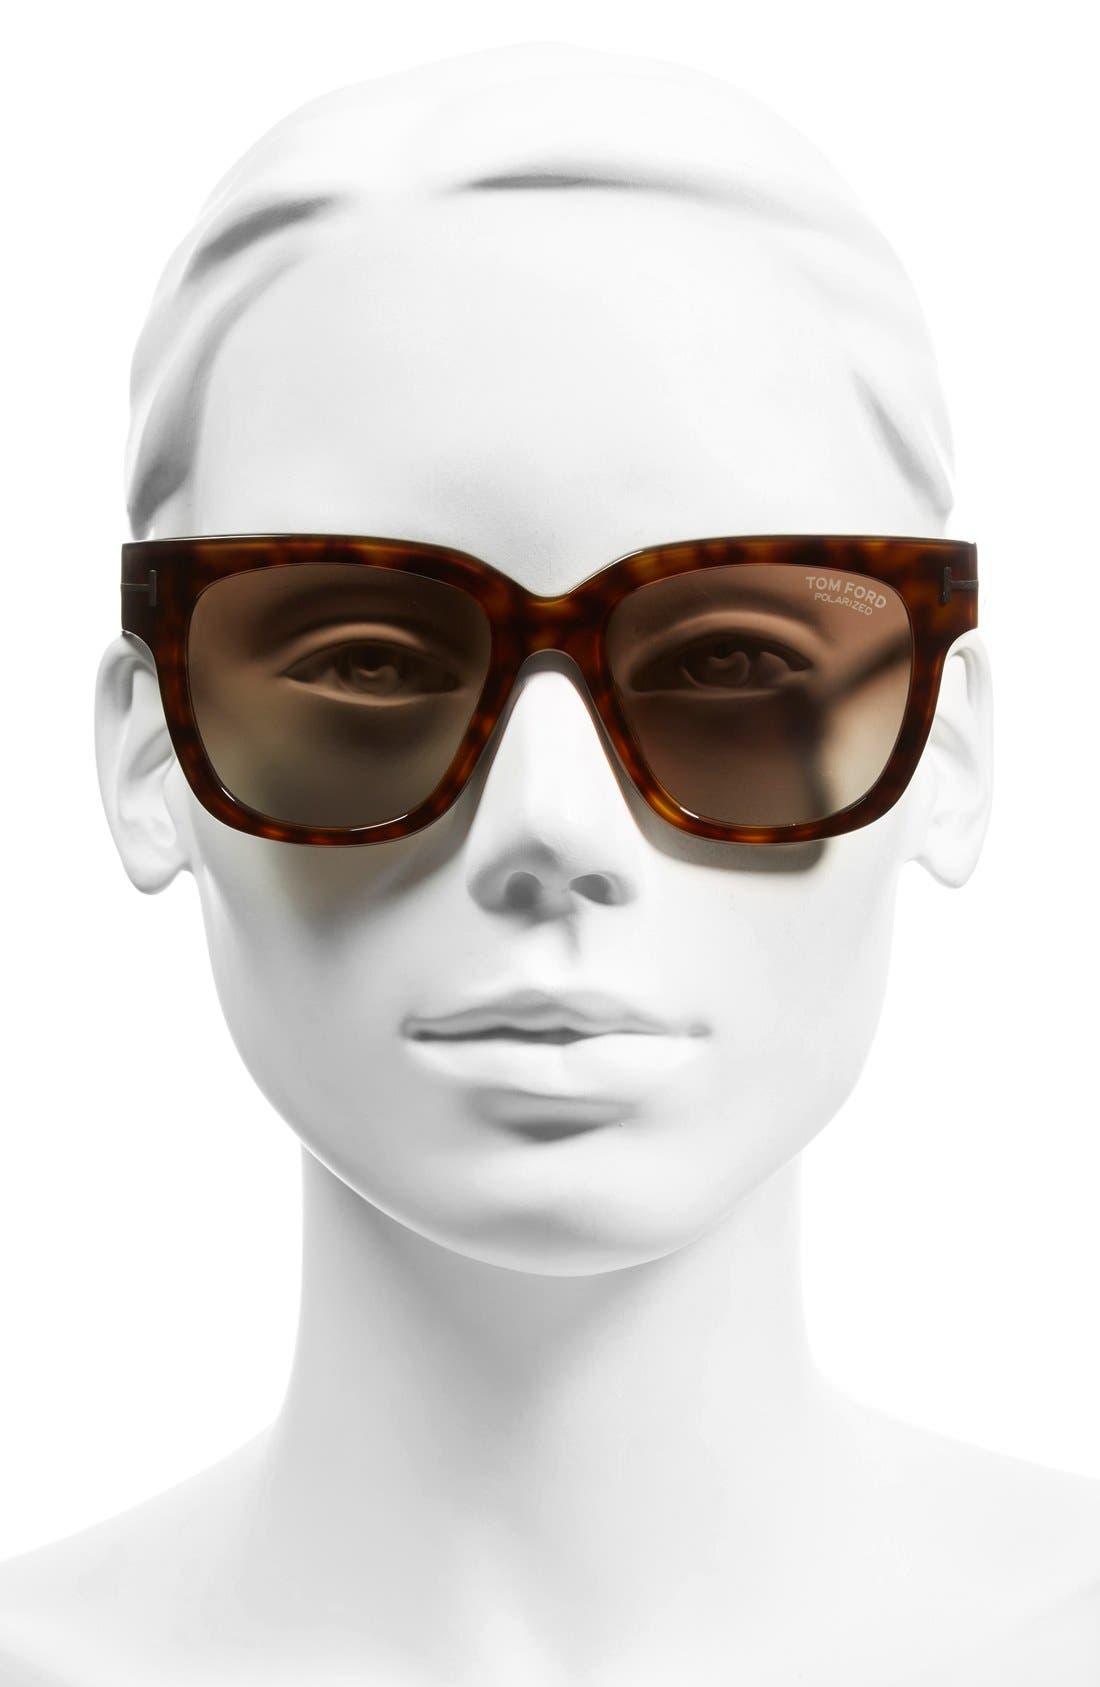 'Tracy' 53mm Retro Sunglasses,                             Alternate thumbnail 2, color,                             Havana/ Brown Polarized